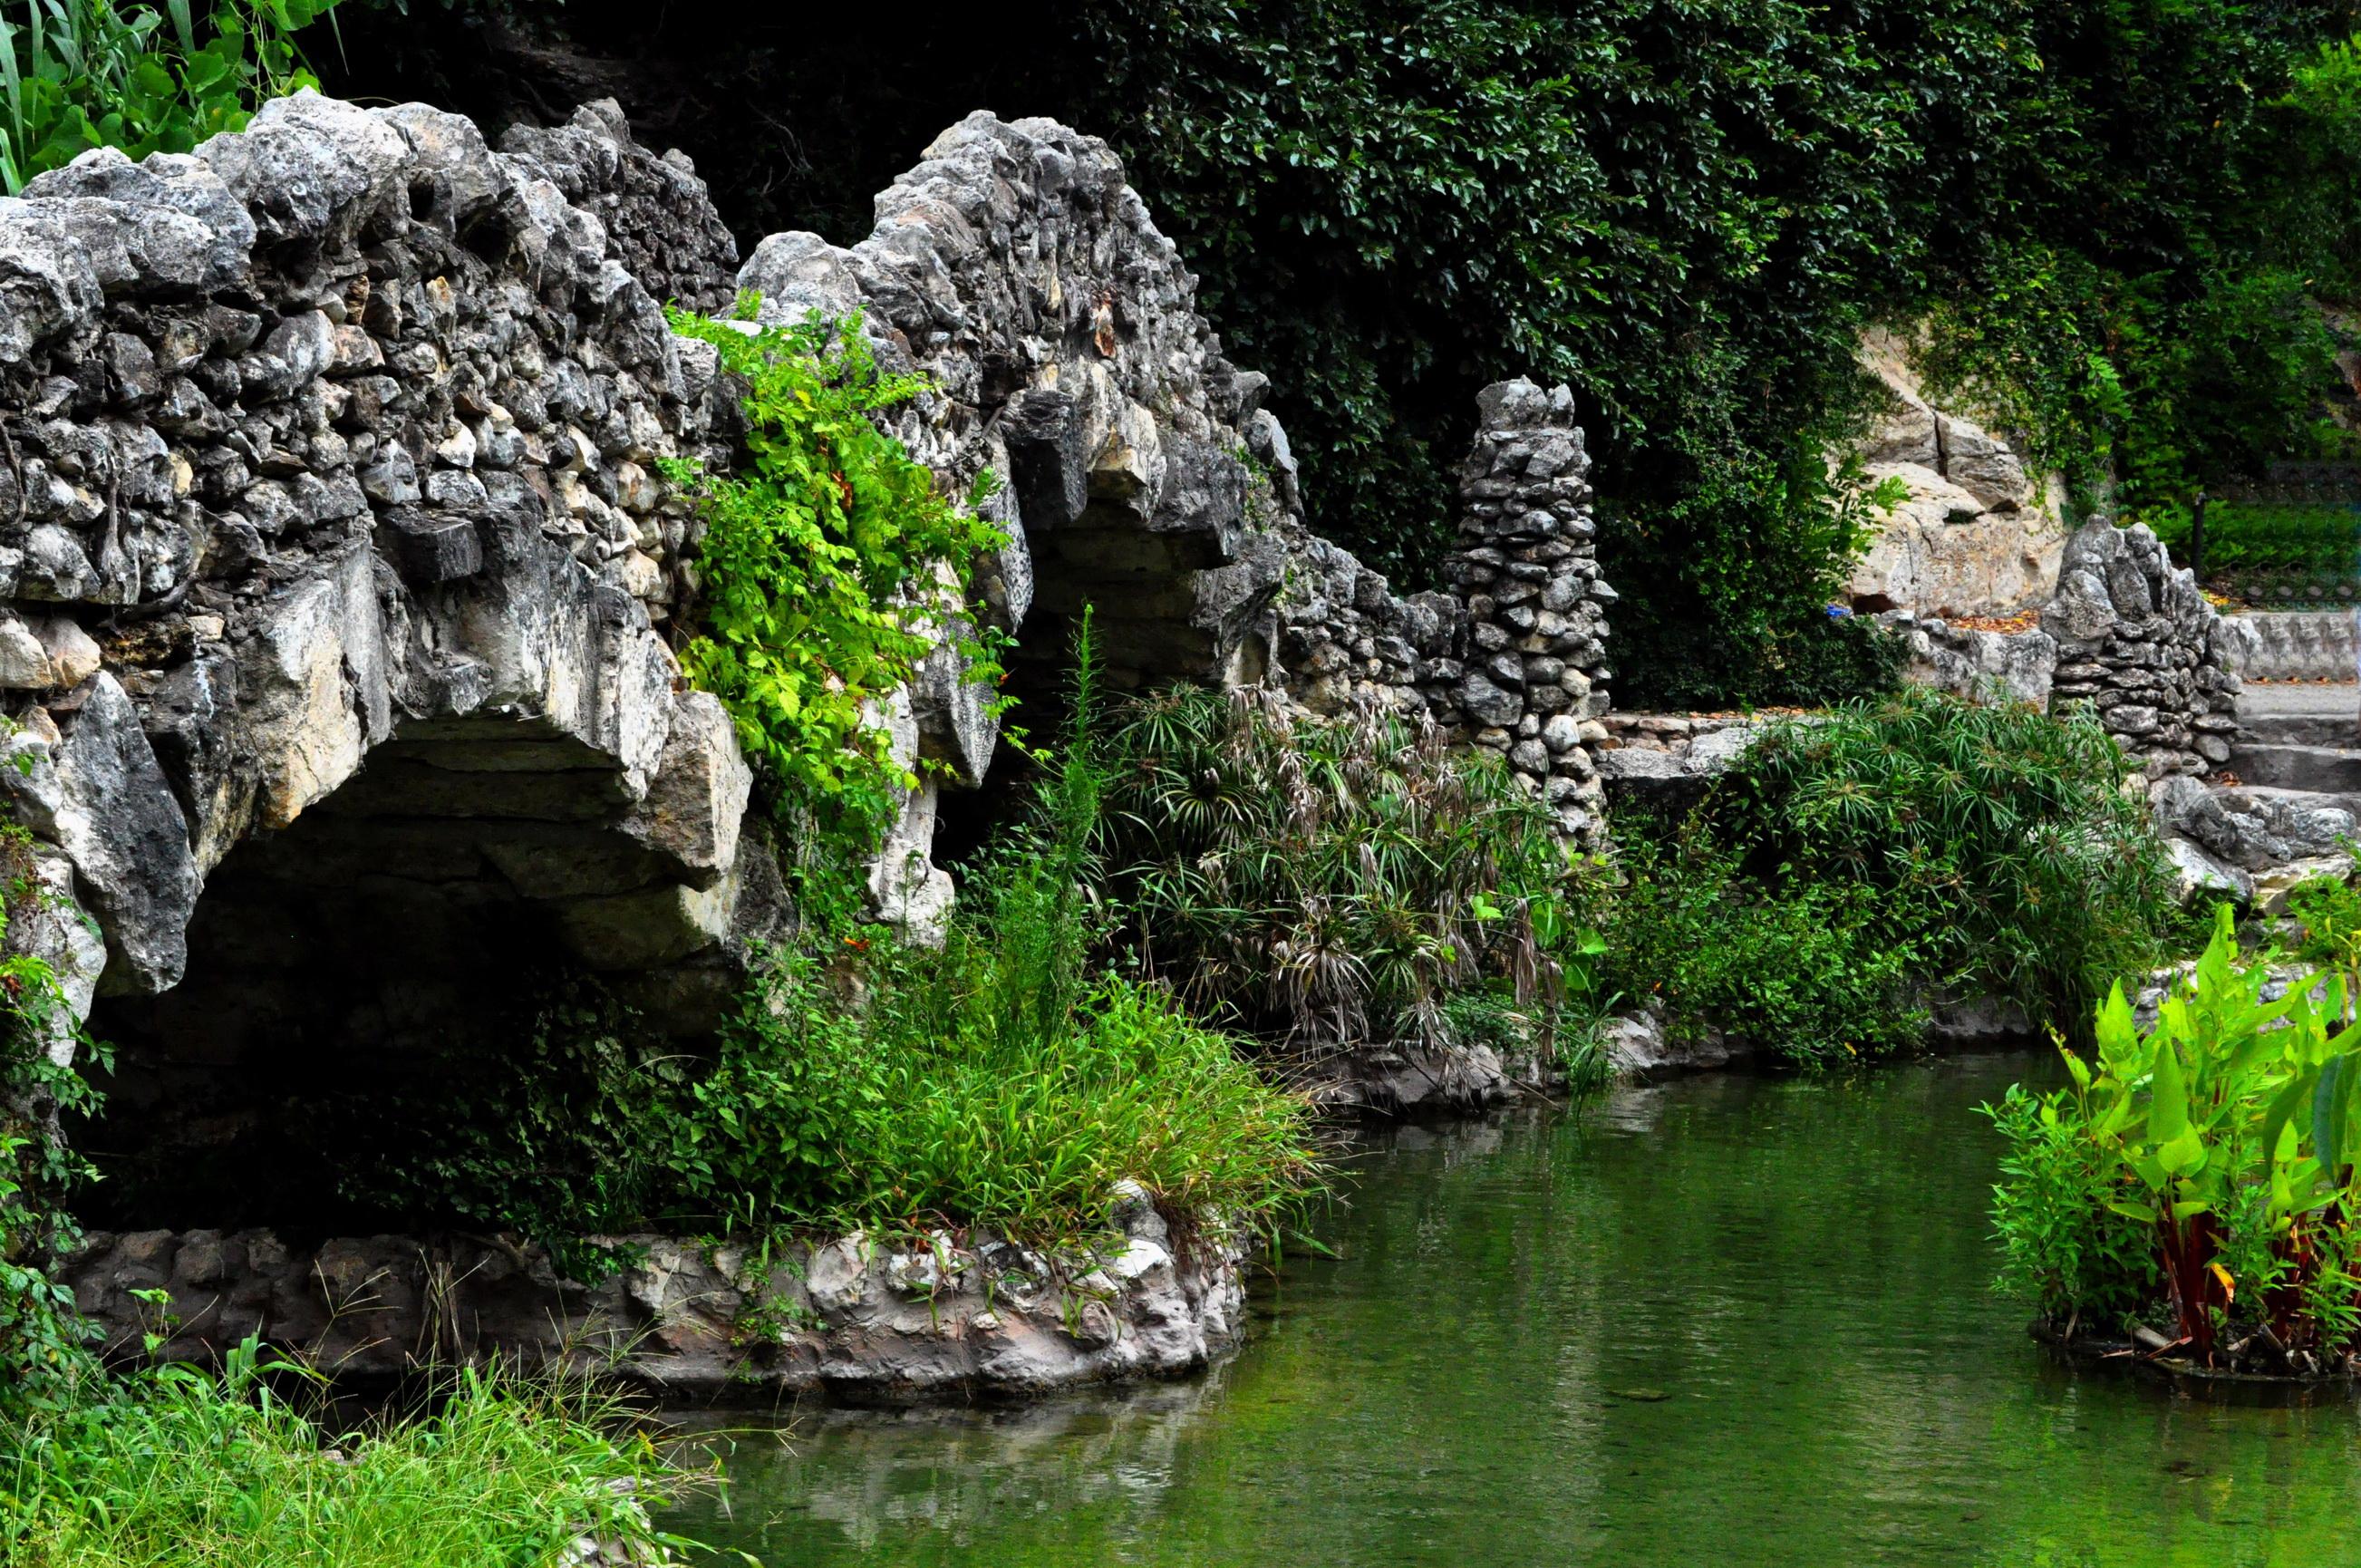 Fonds d 39 ecran jardins tang japanese san antonio texas for Fond d ecran gratuit 974